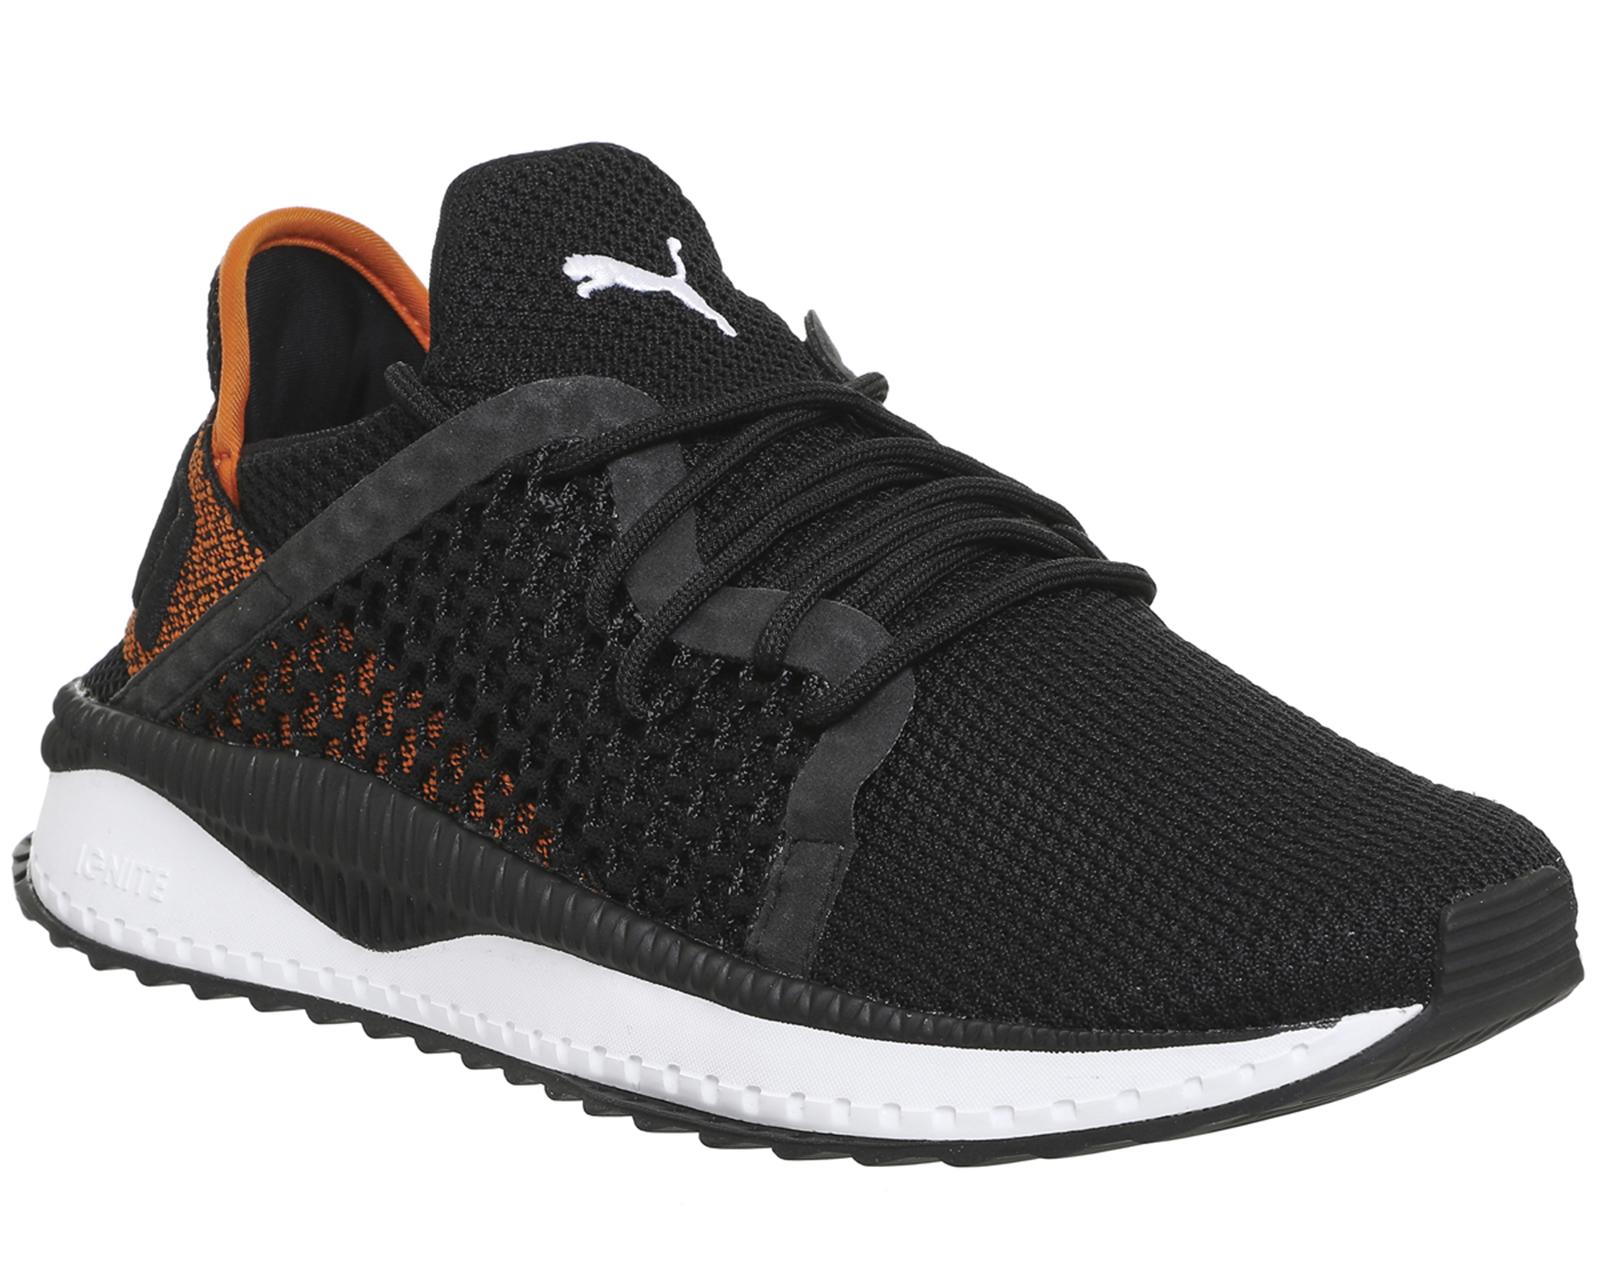 6d943326c14cd ... Puma-Tsugi-Netfit-BLACK-WHITE-Trainers-Shoes ...